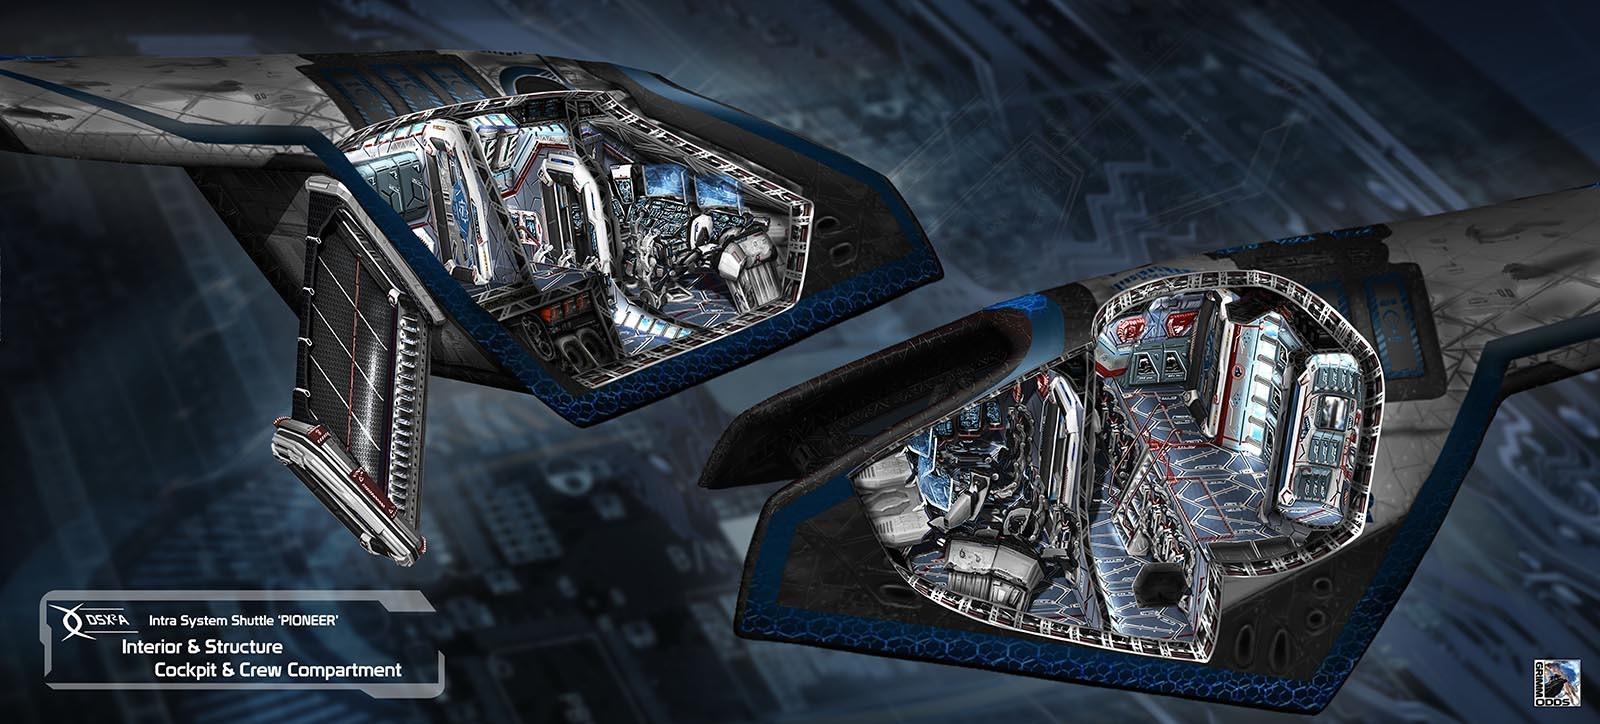 Grimm Odds - Shuttle Interior - Cockpit Section